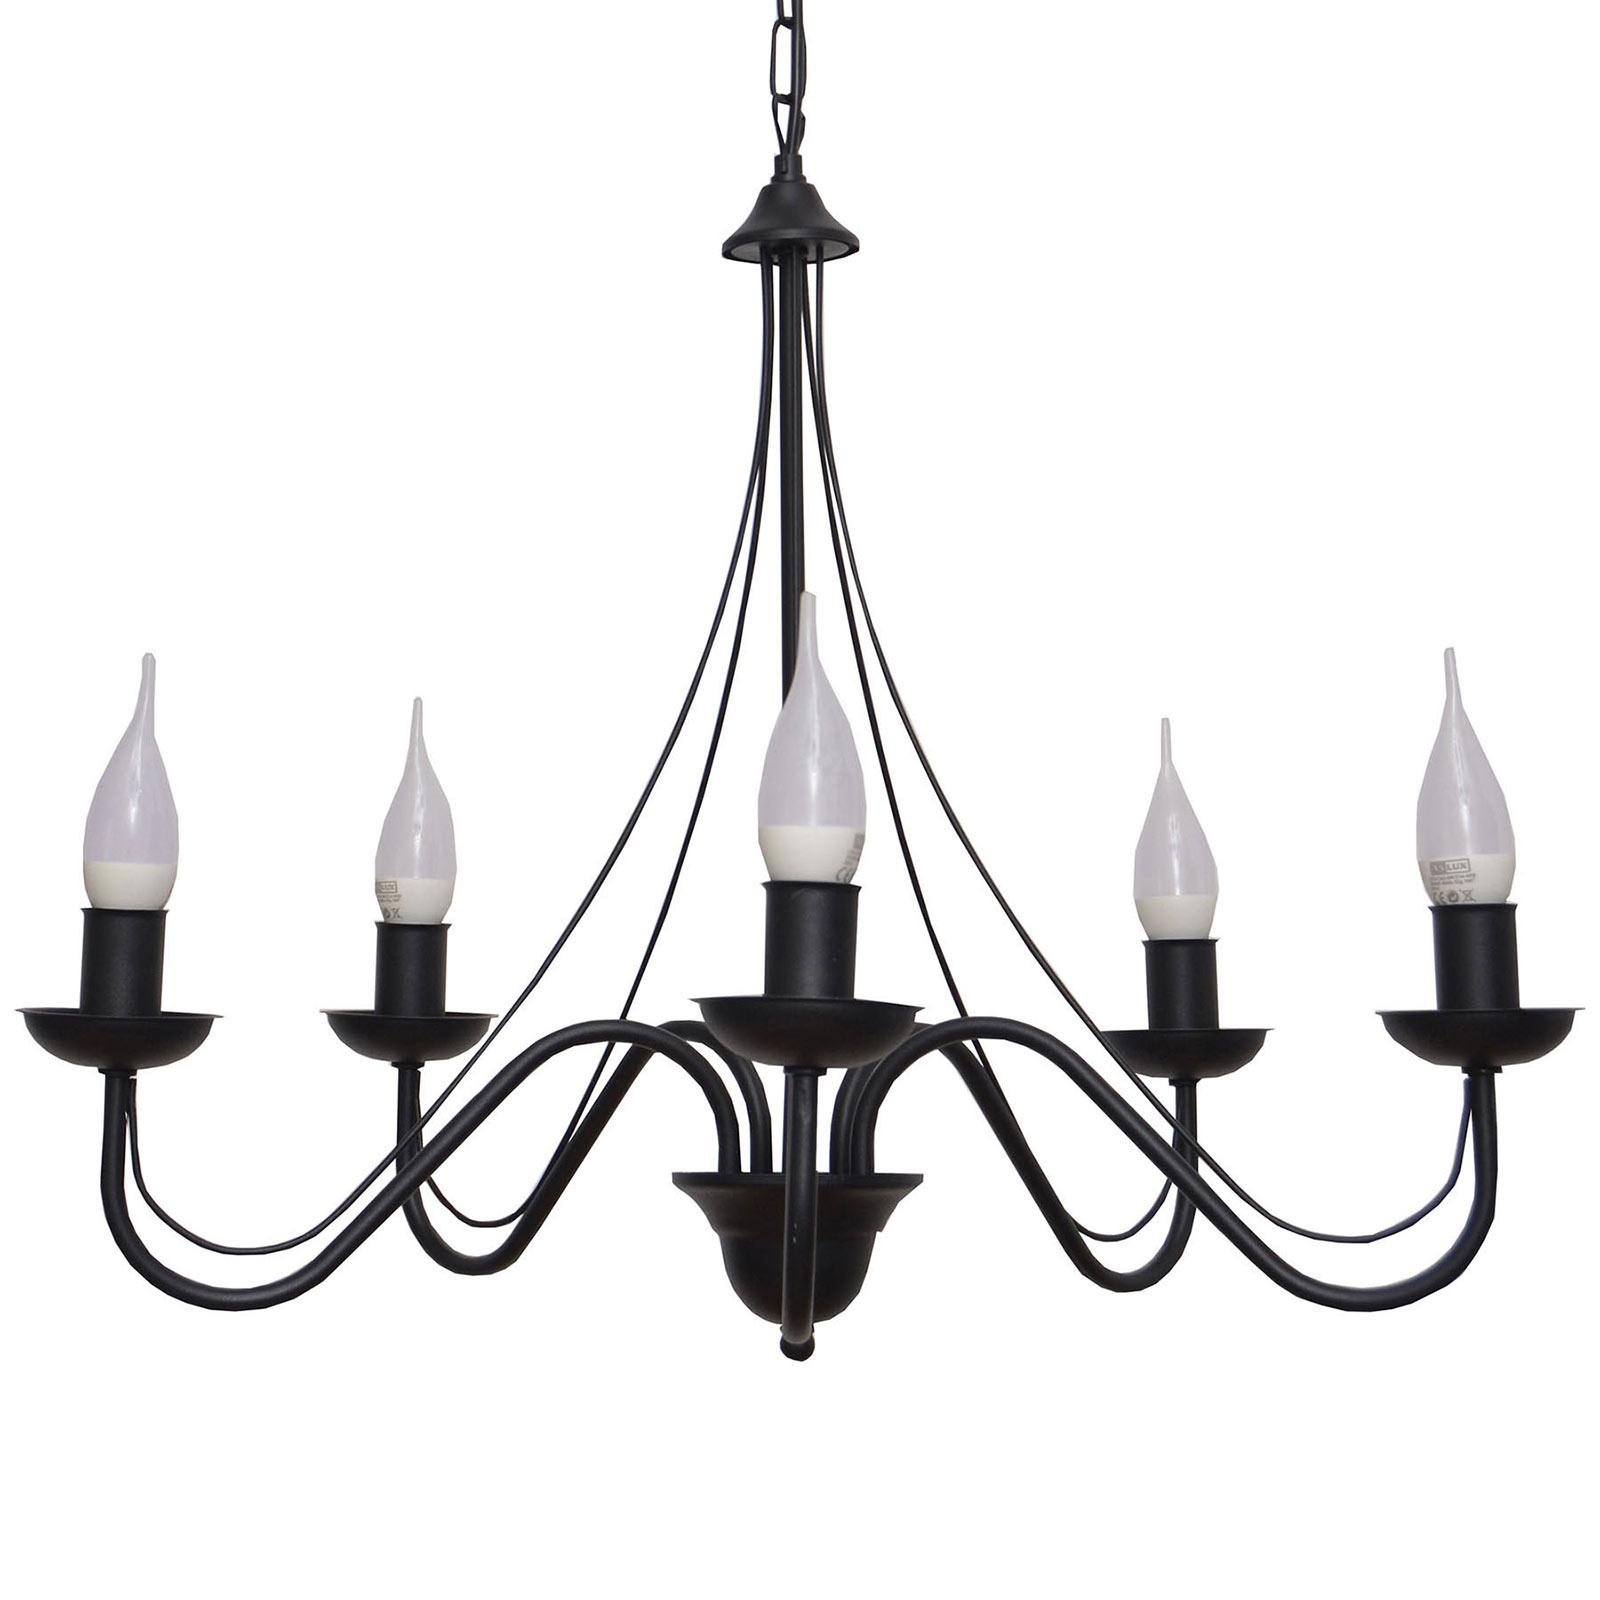 Kroonluchter Malbo 5-lamps in zwart